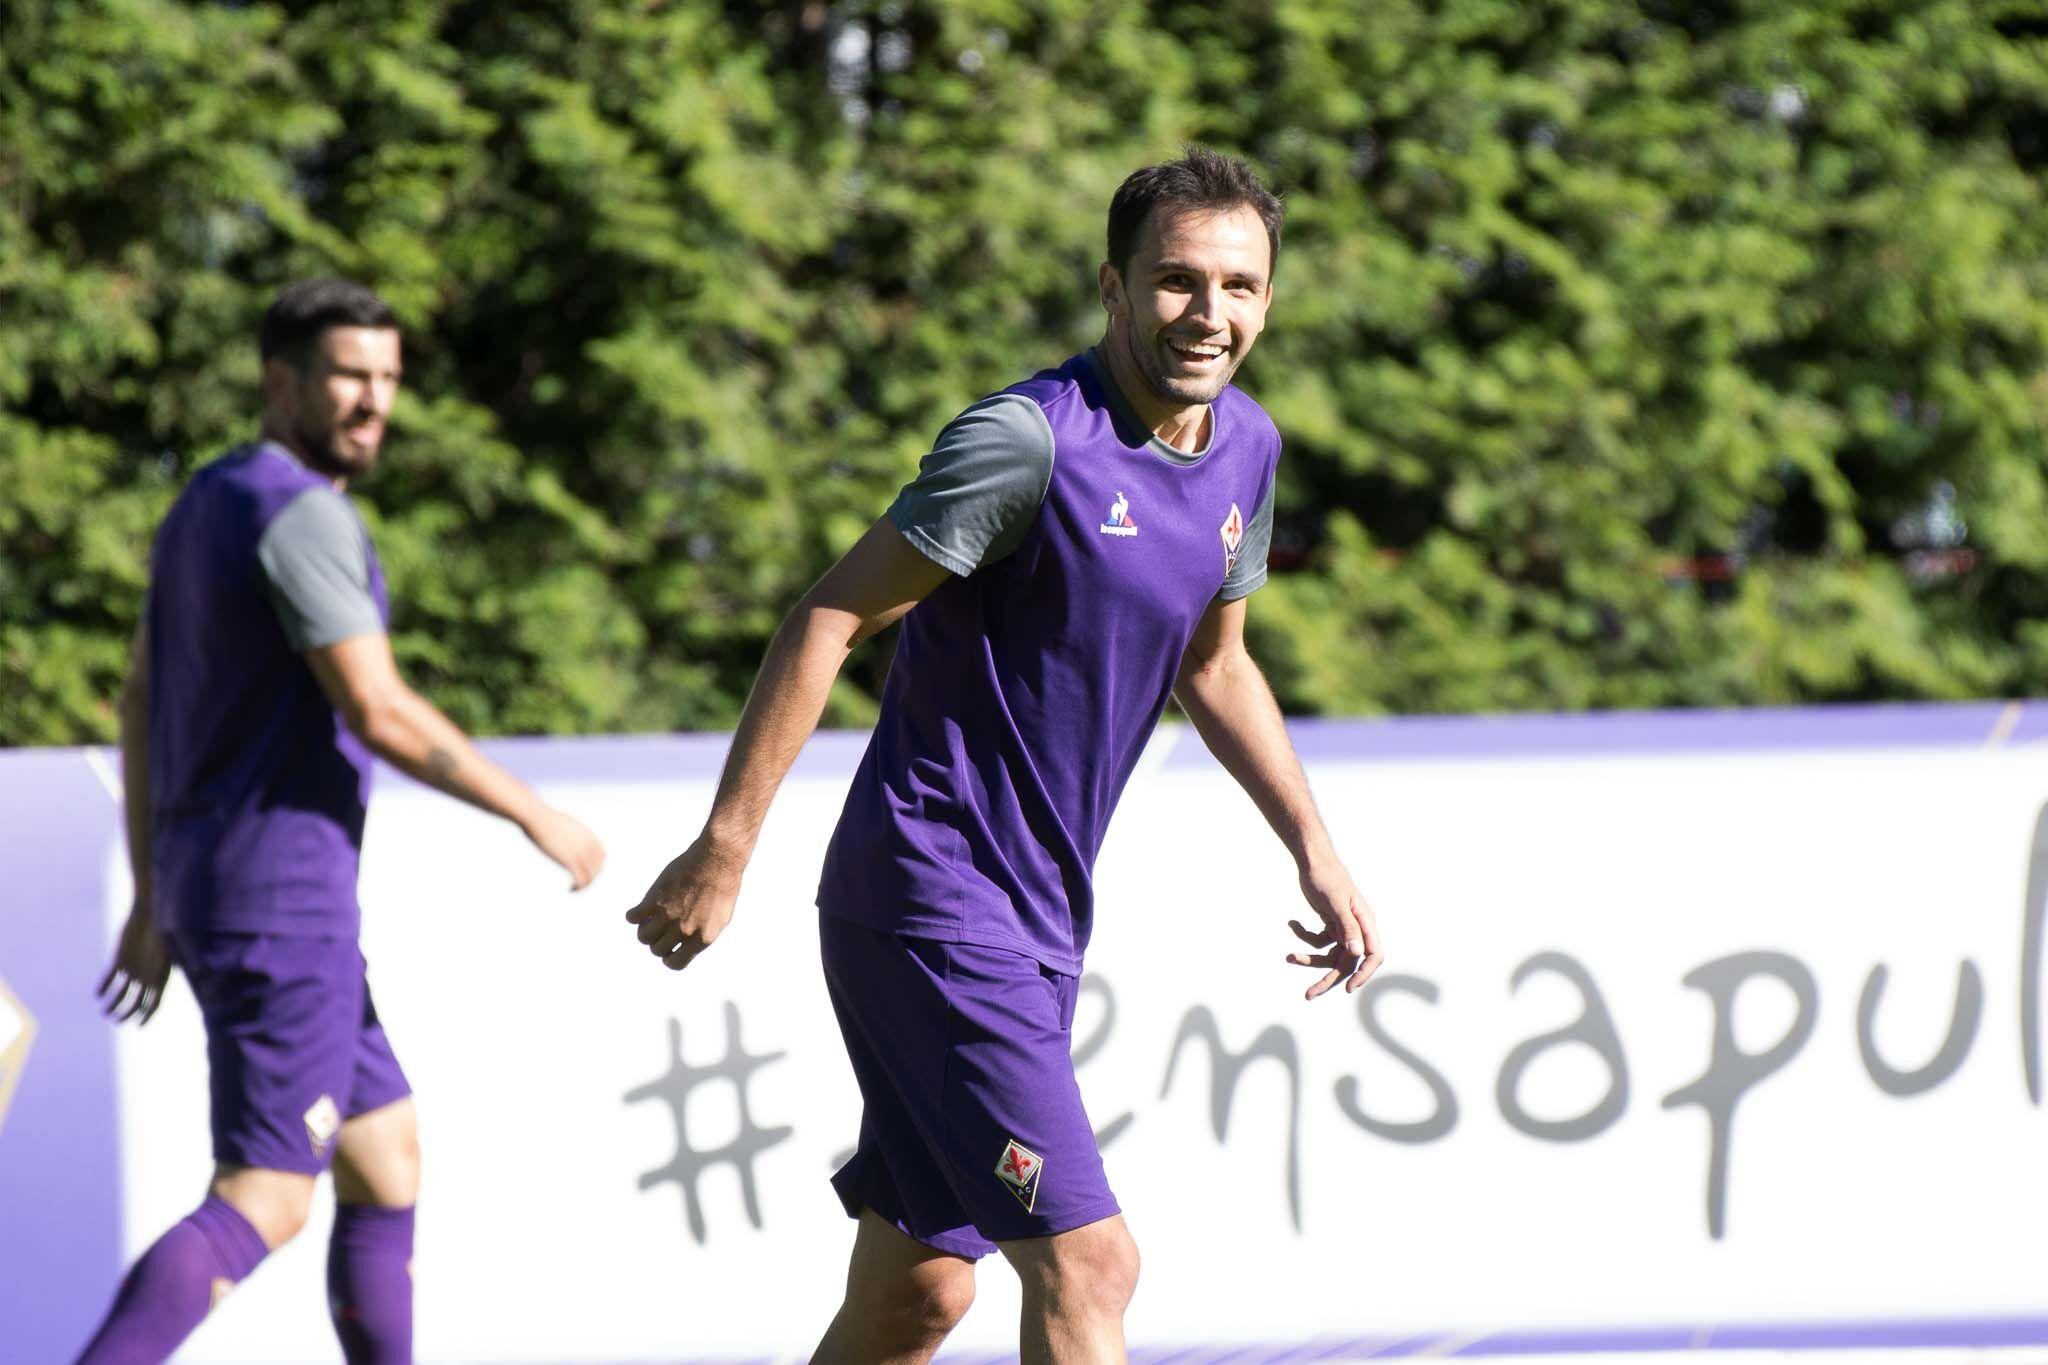 Badelj, ufficiale: niente Milan, rimane alla Fiorentina